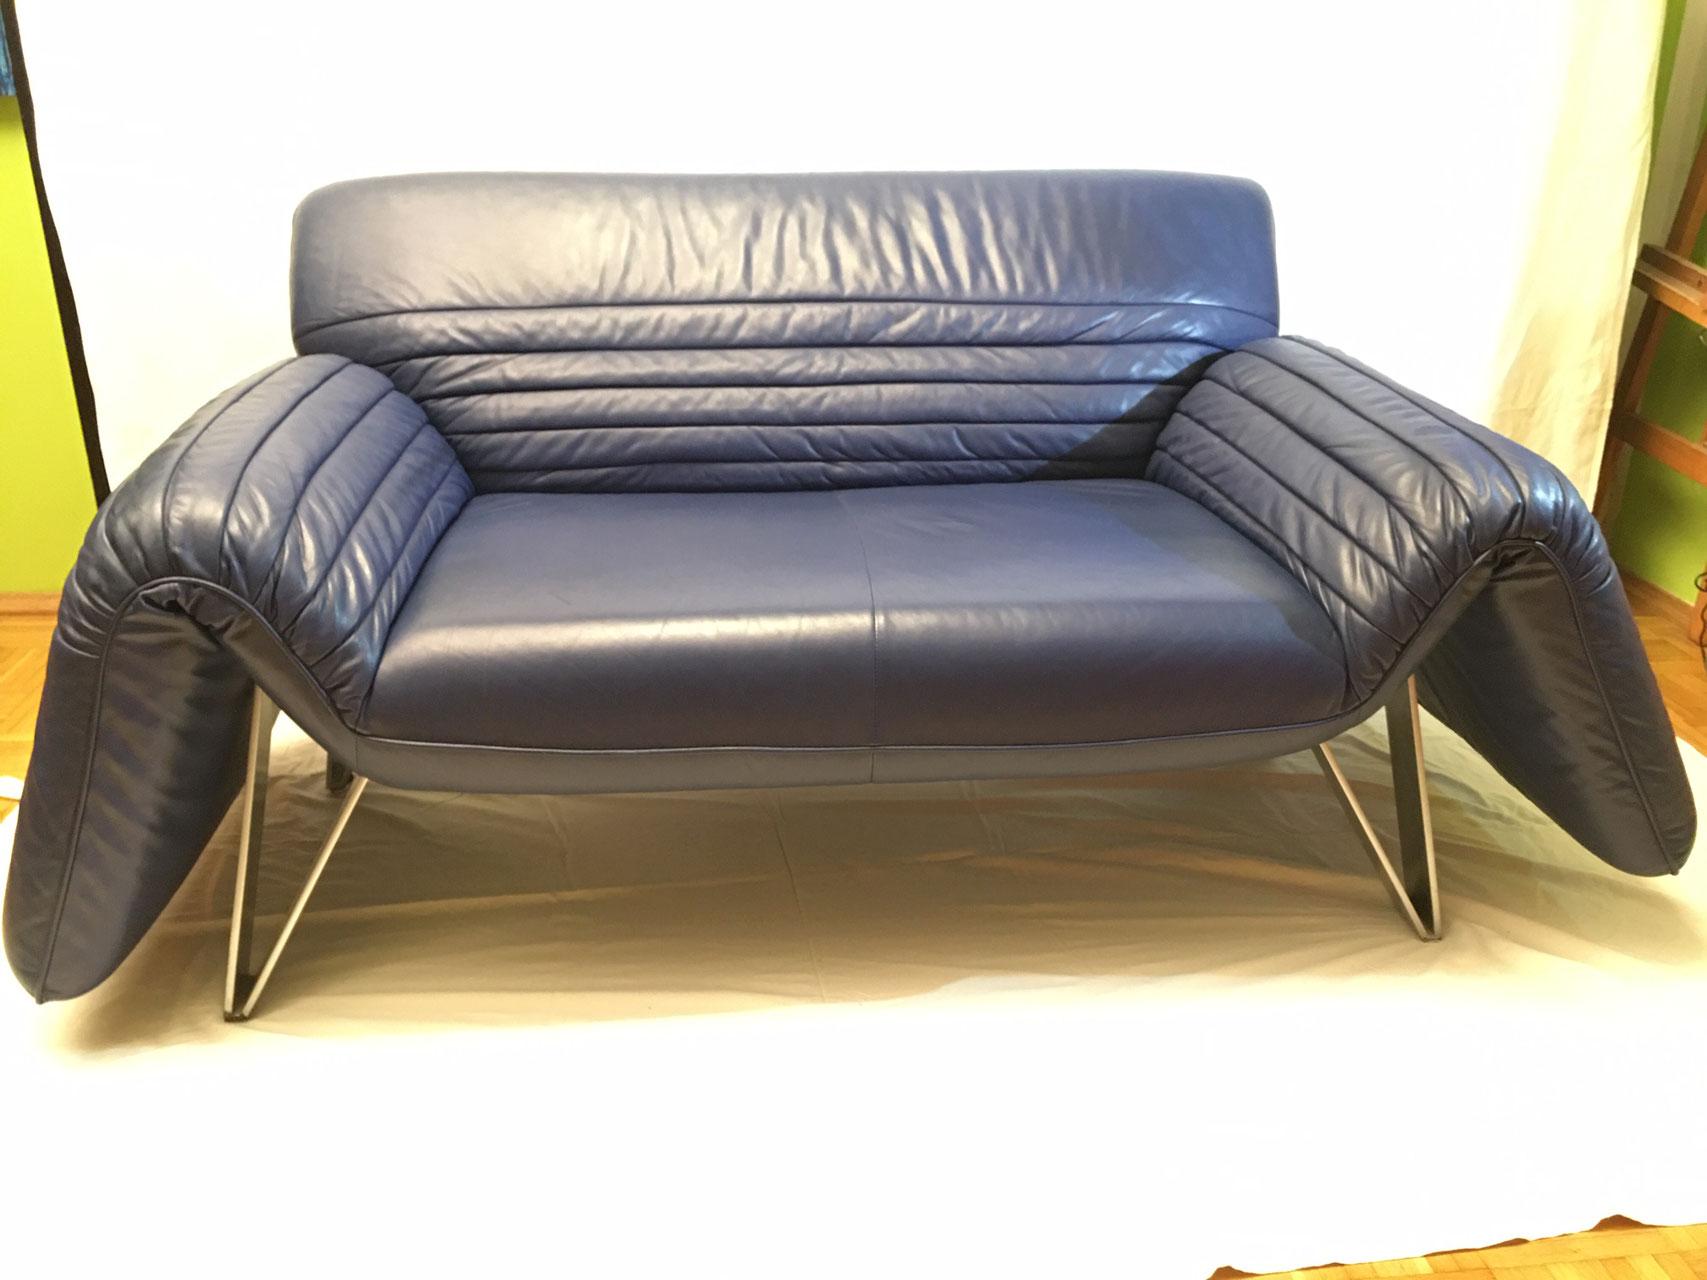 Full Size of De Sede Sofa Preis Endless Ds 600 By Used For Sale Uk Furniture Usa Outlet Bed Sessel Gebraucht Schweiz Sleeper Bi Design Ds142 Gebrauchte Designermbel Sofa De Sede Sofa